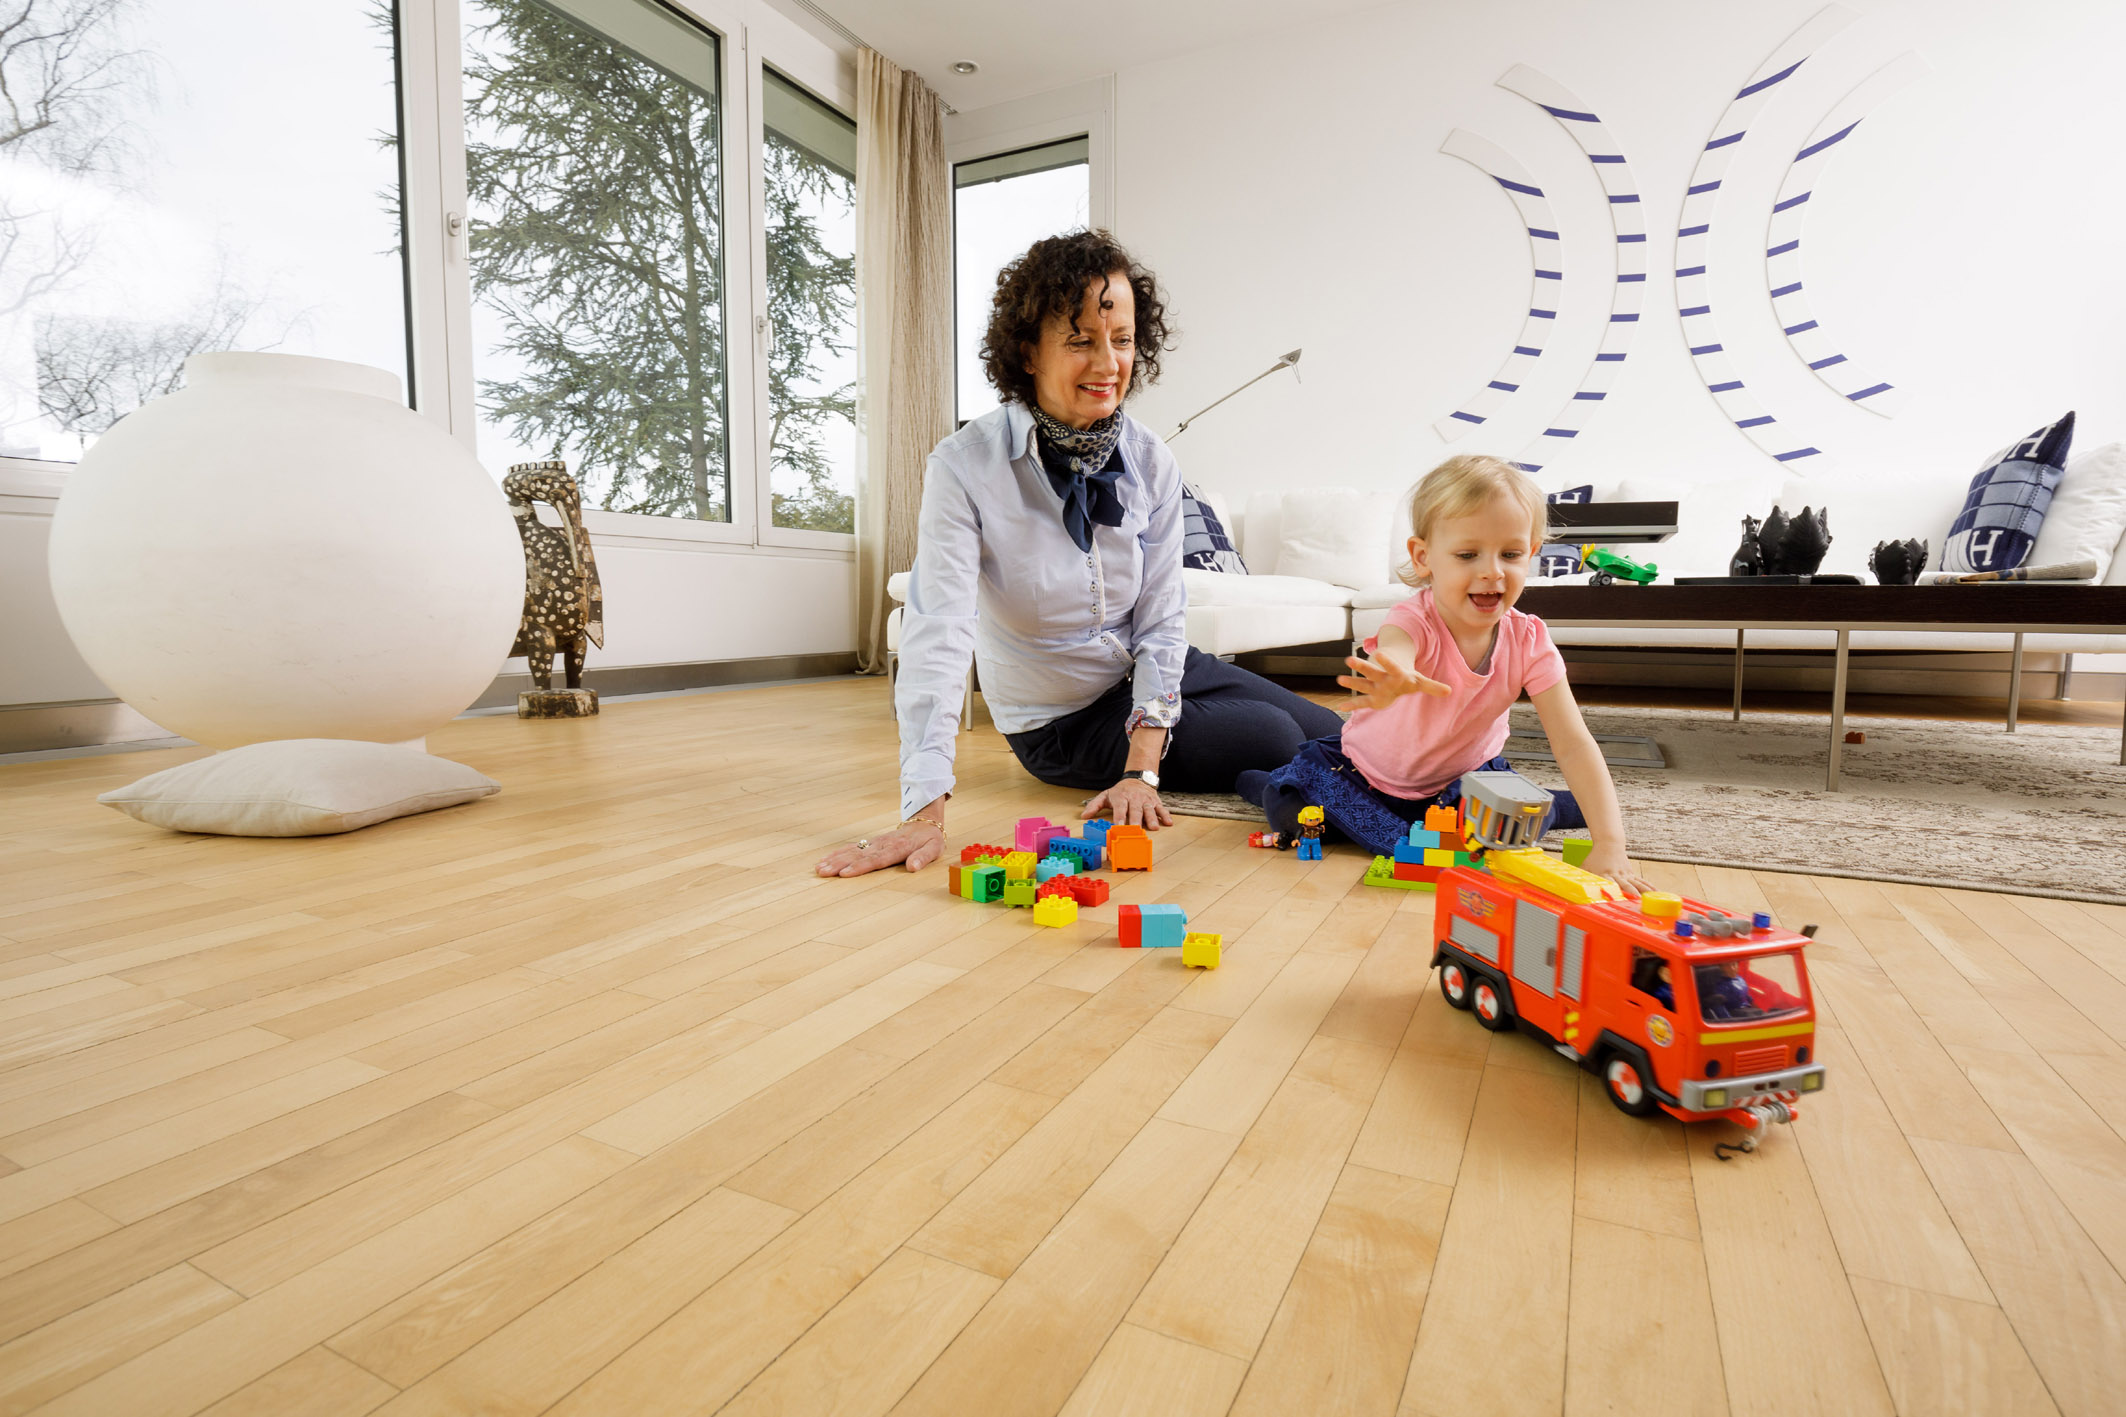 Holzboden Fußbodenheizung ~ Holzböden und fußbodenheizungen sind ideale partner u2013 warme sohle